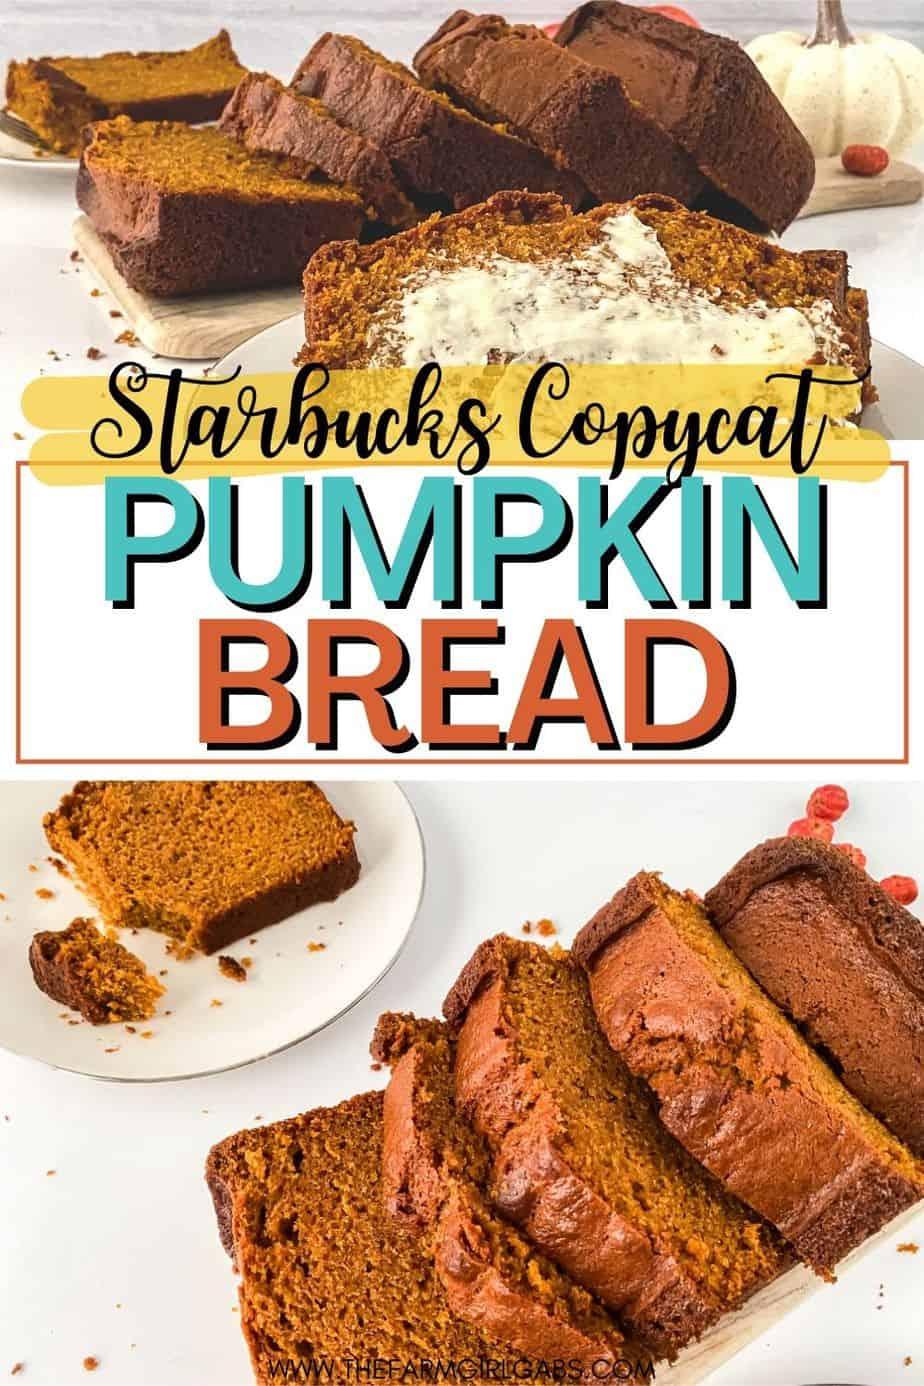 easy pumpkin bread recipe (Starbucks copycat)